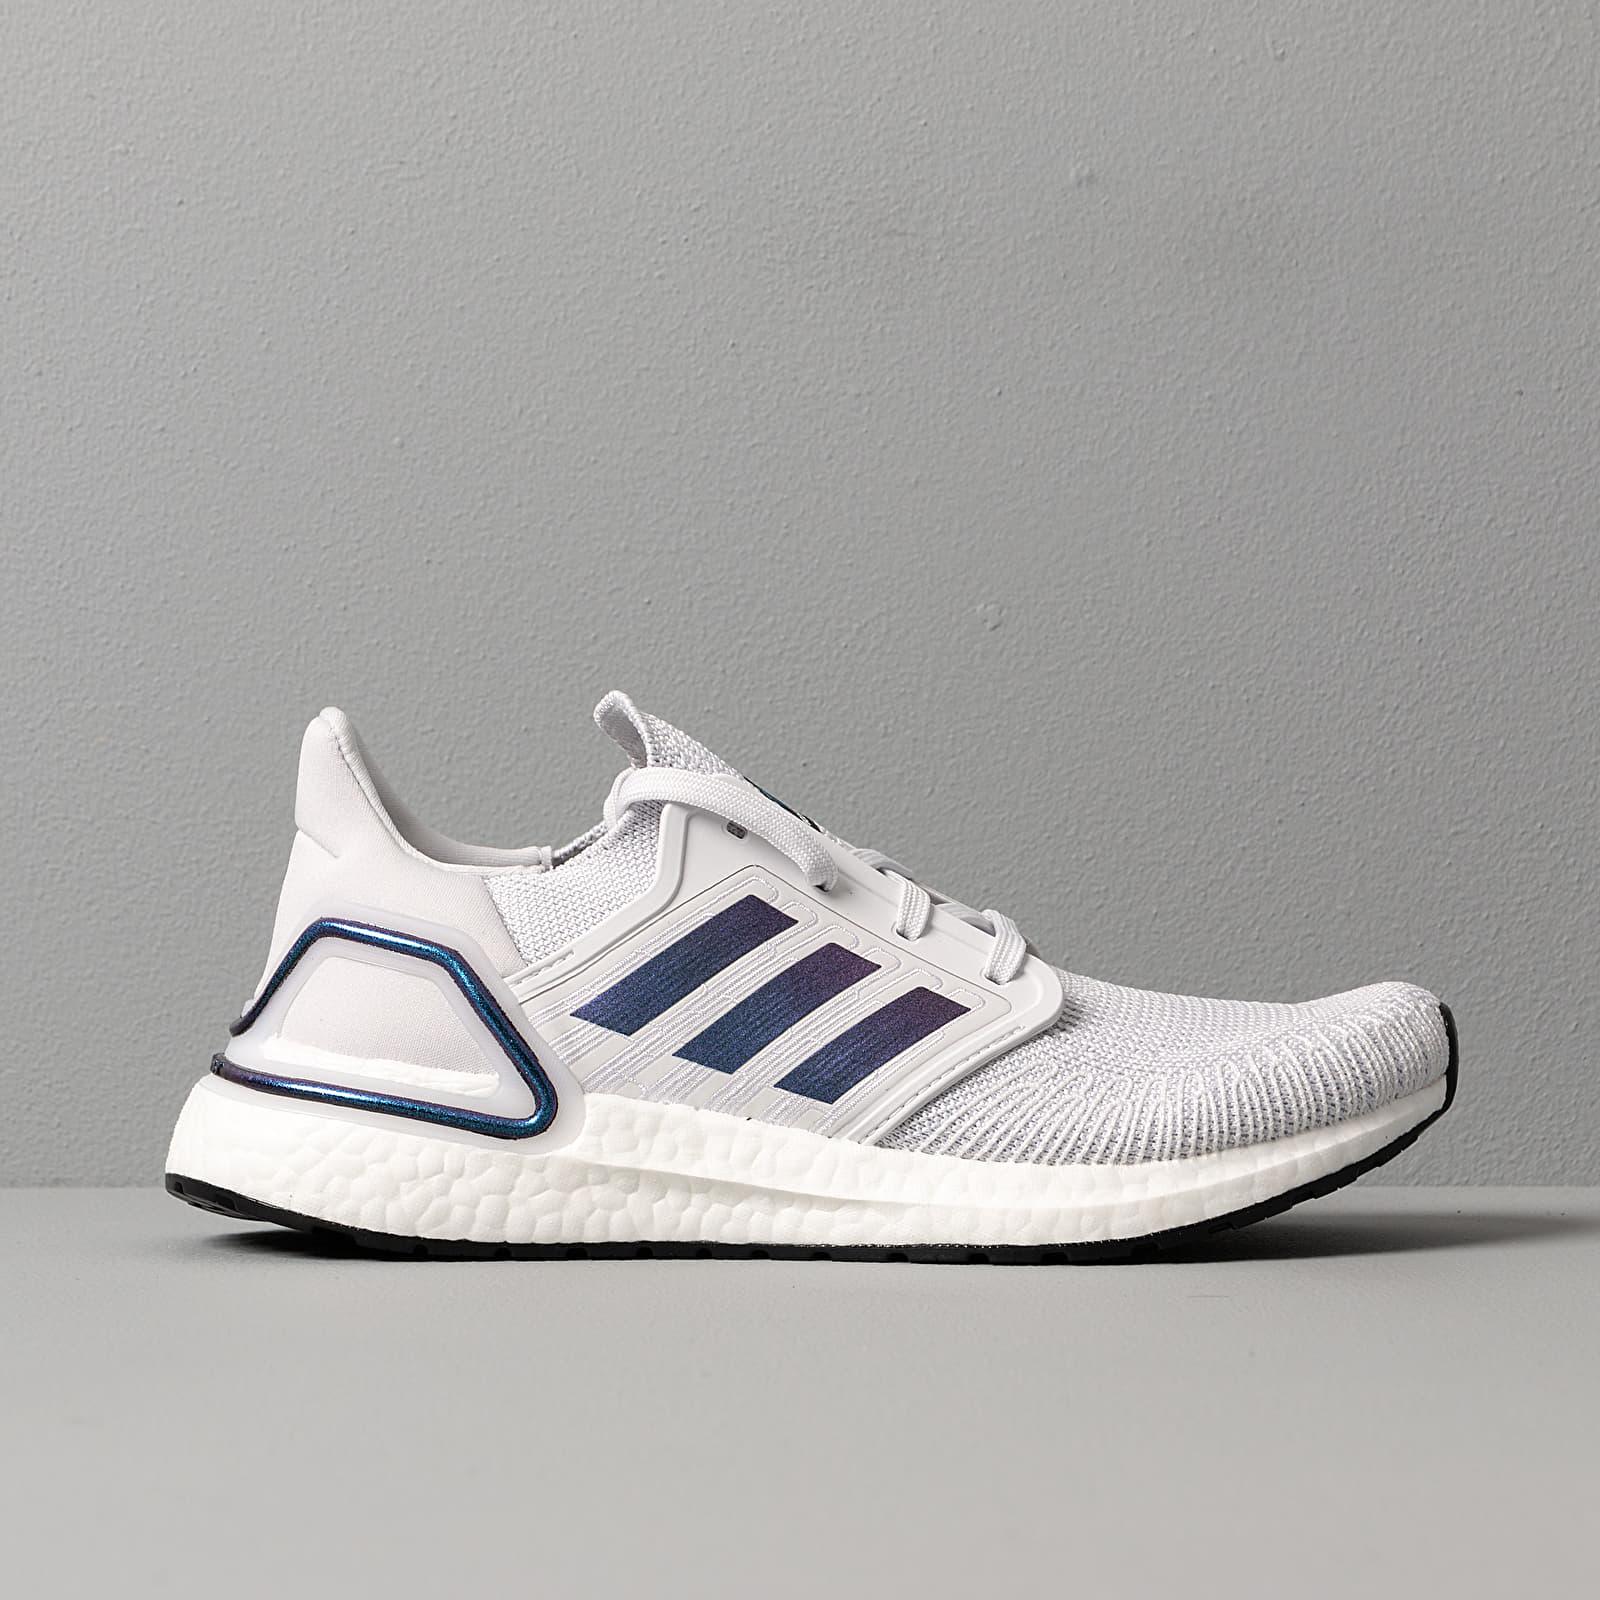 adidas UltraBOOST 20 W Dash Grey Blue Vime Core Black | Footshop